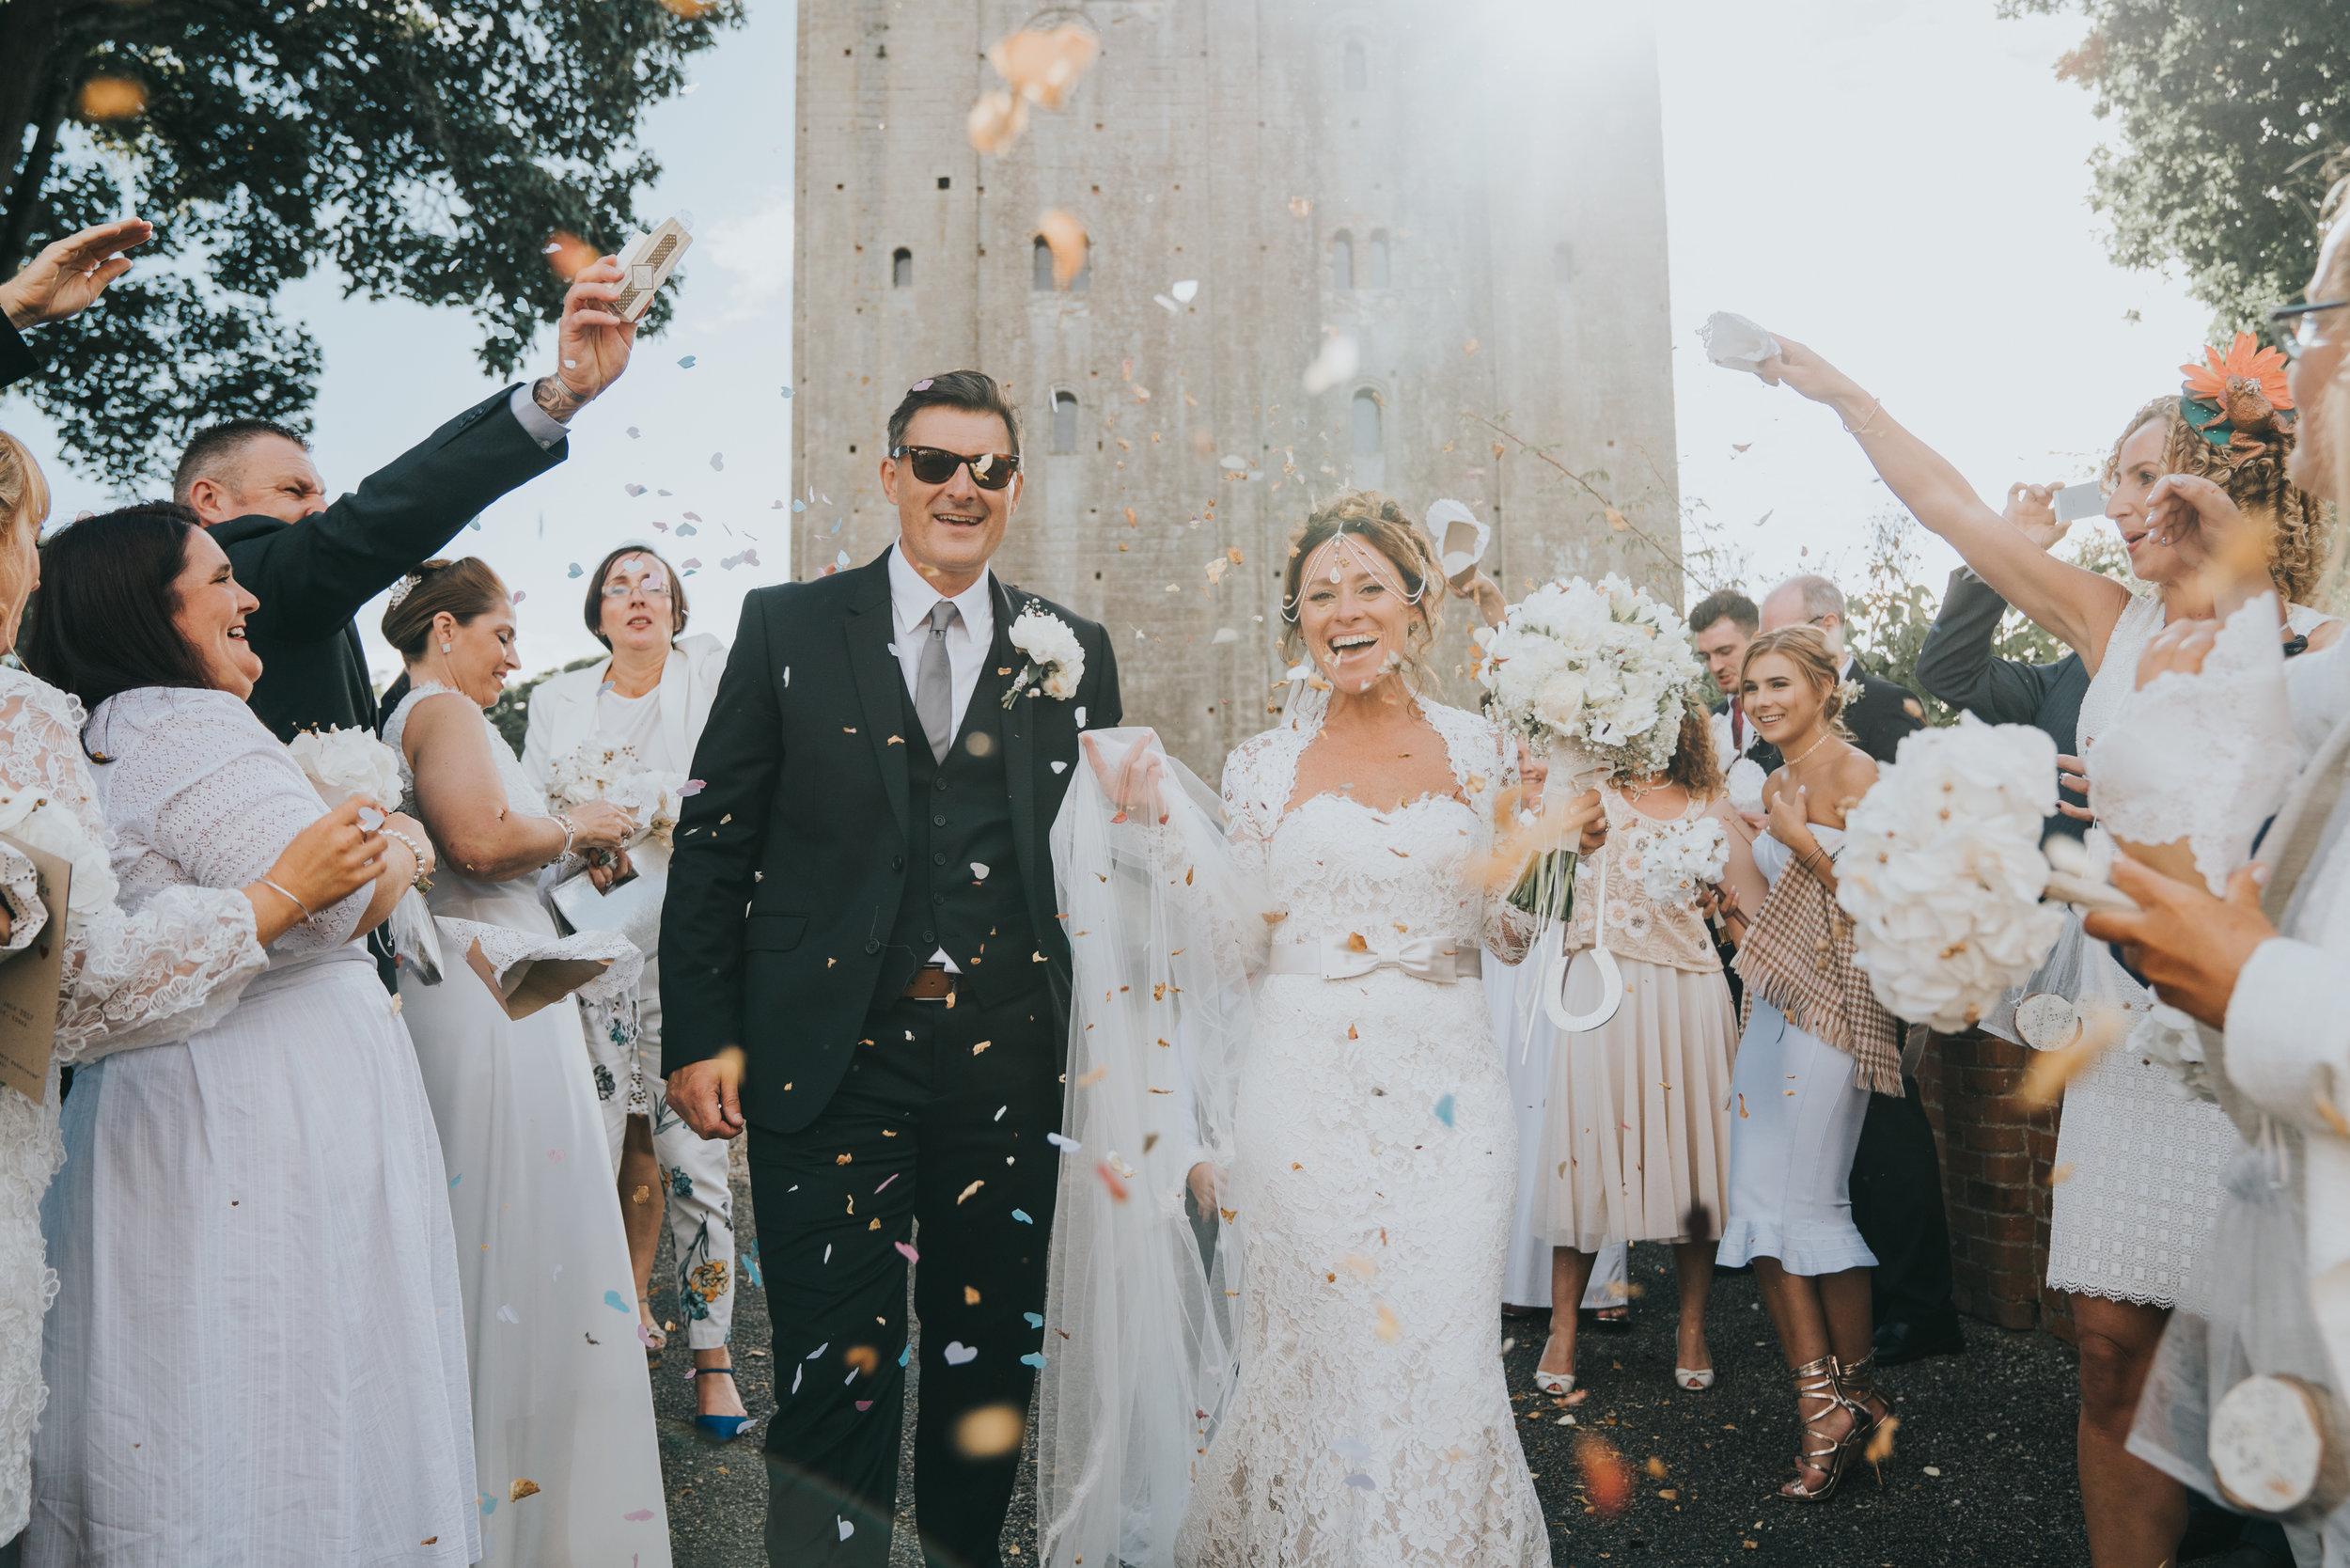 Wedding+2017+-+2018+(14+of+17).jpg